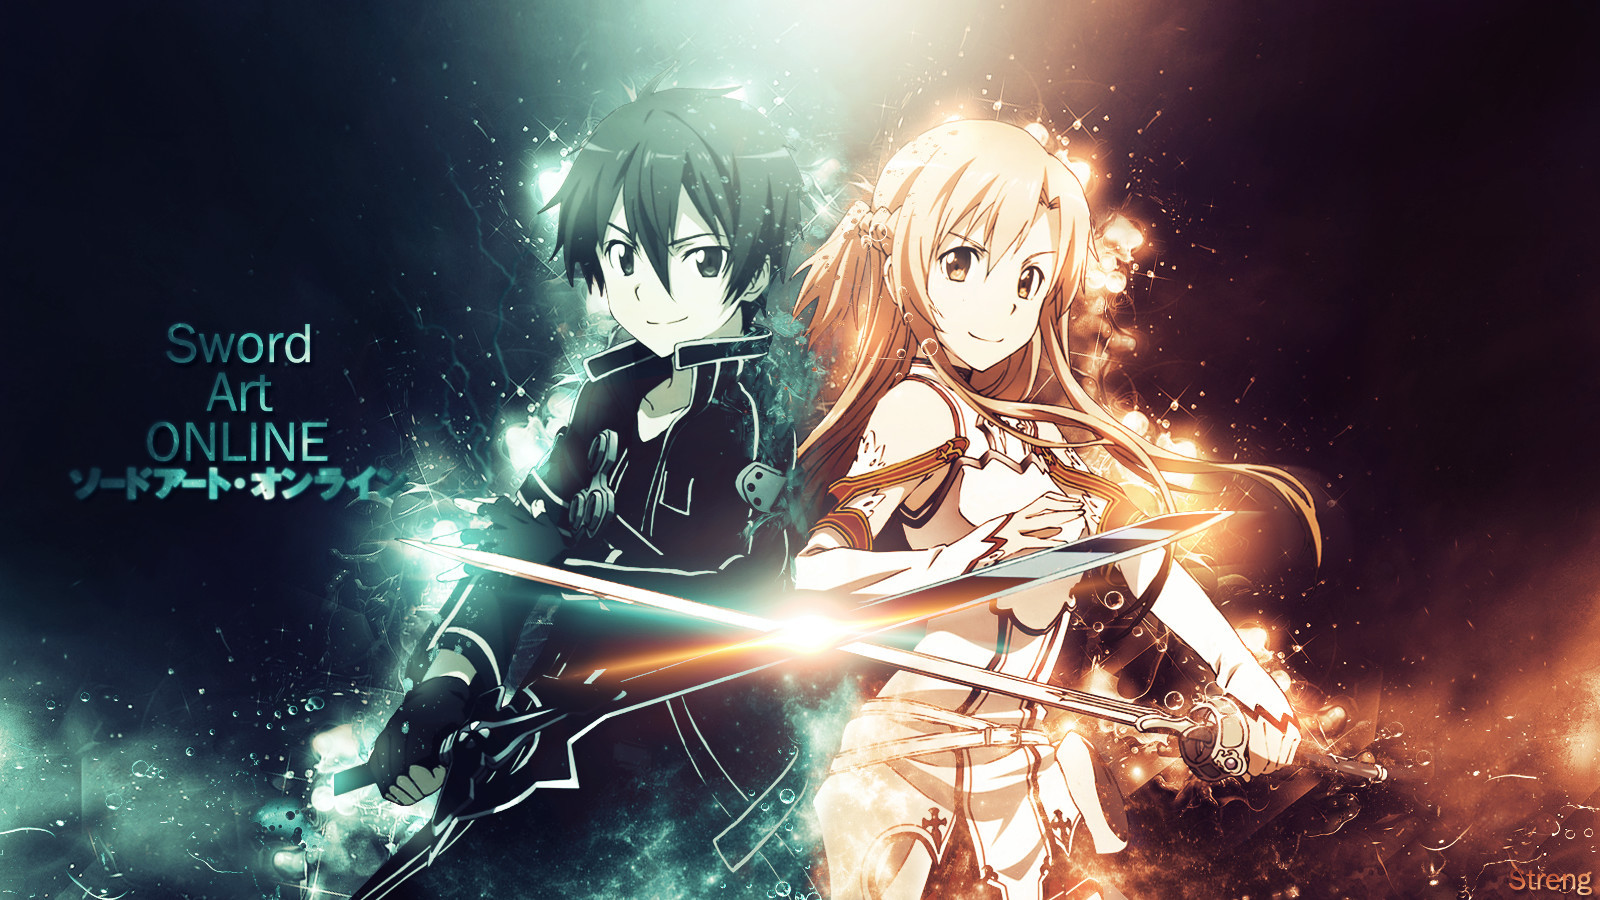 sword_art_online_wallpaper_by_strengxd-d6oggql.jpg